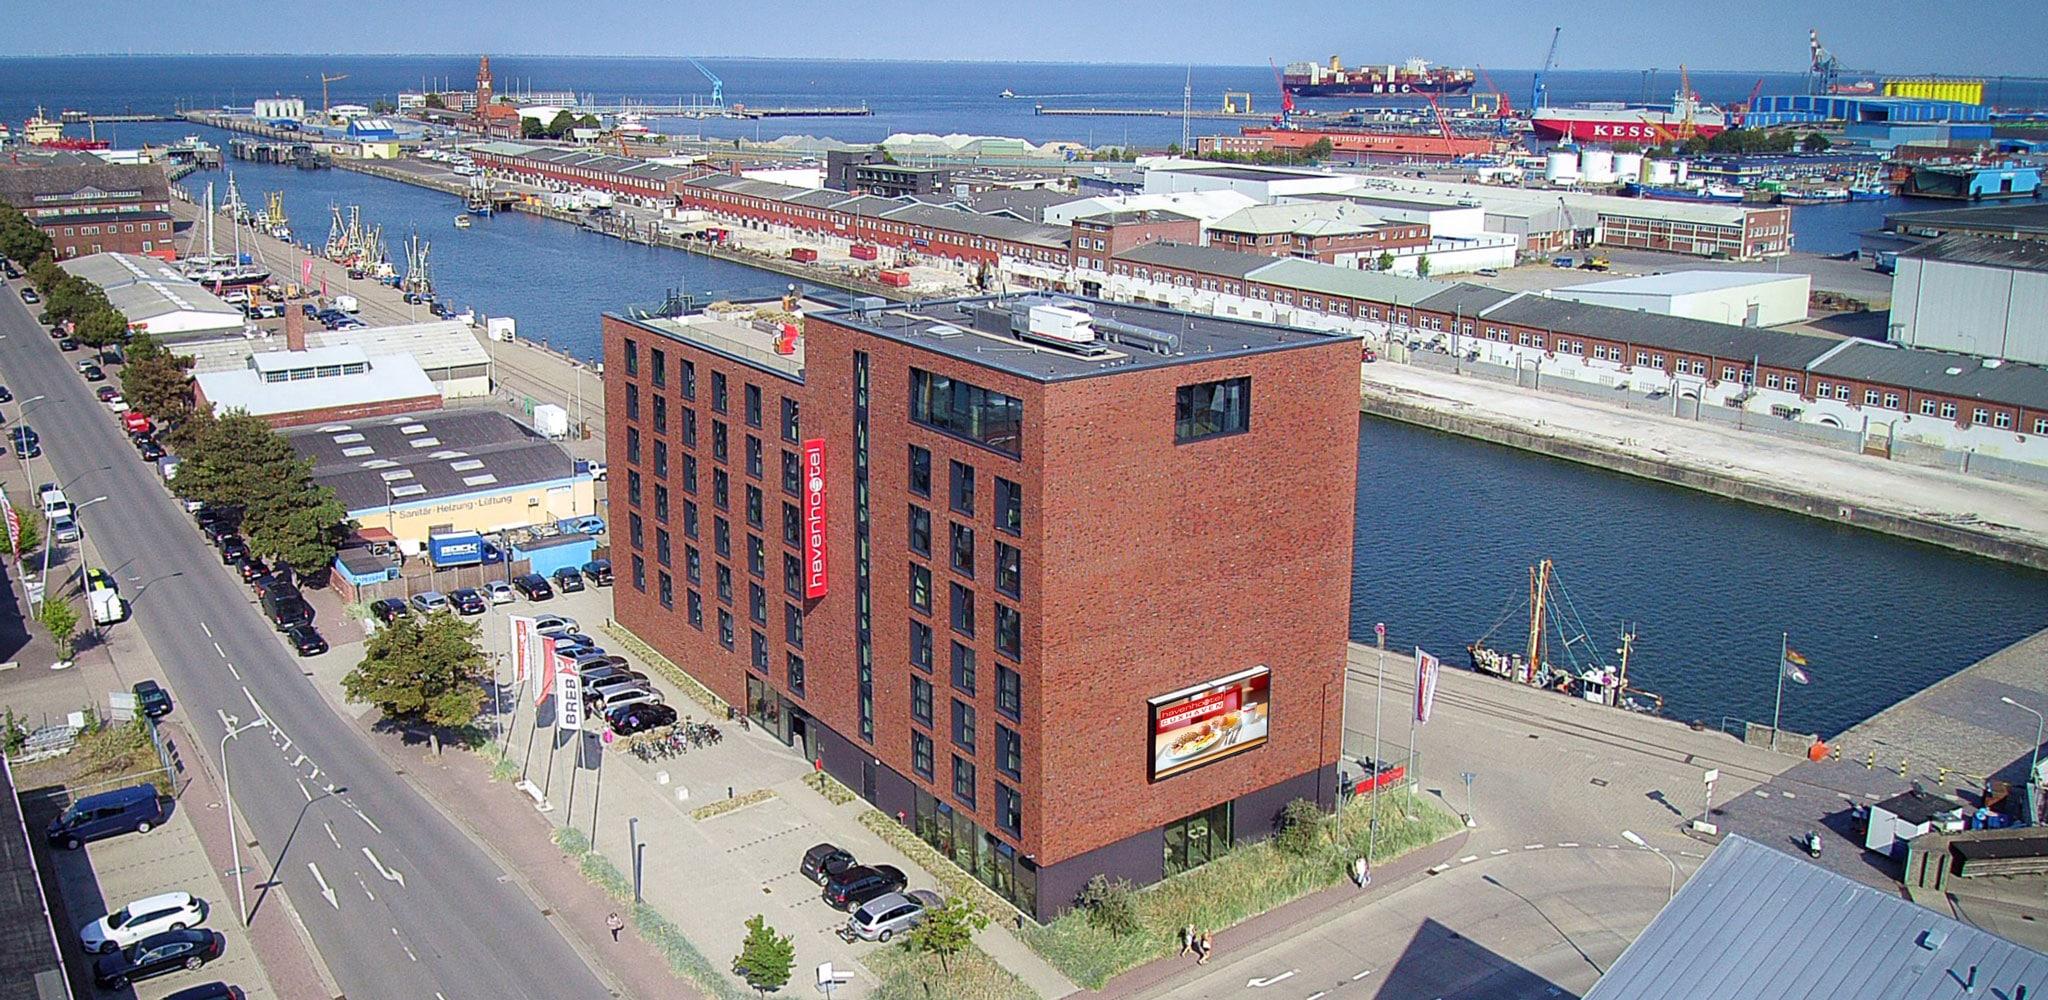 havenhostel Cuxhaven Luftbild